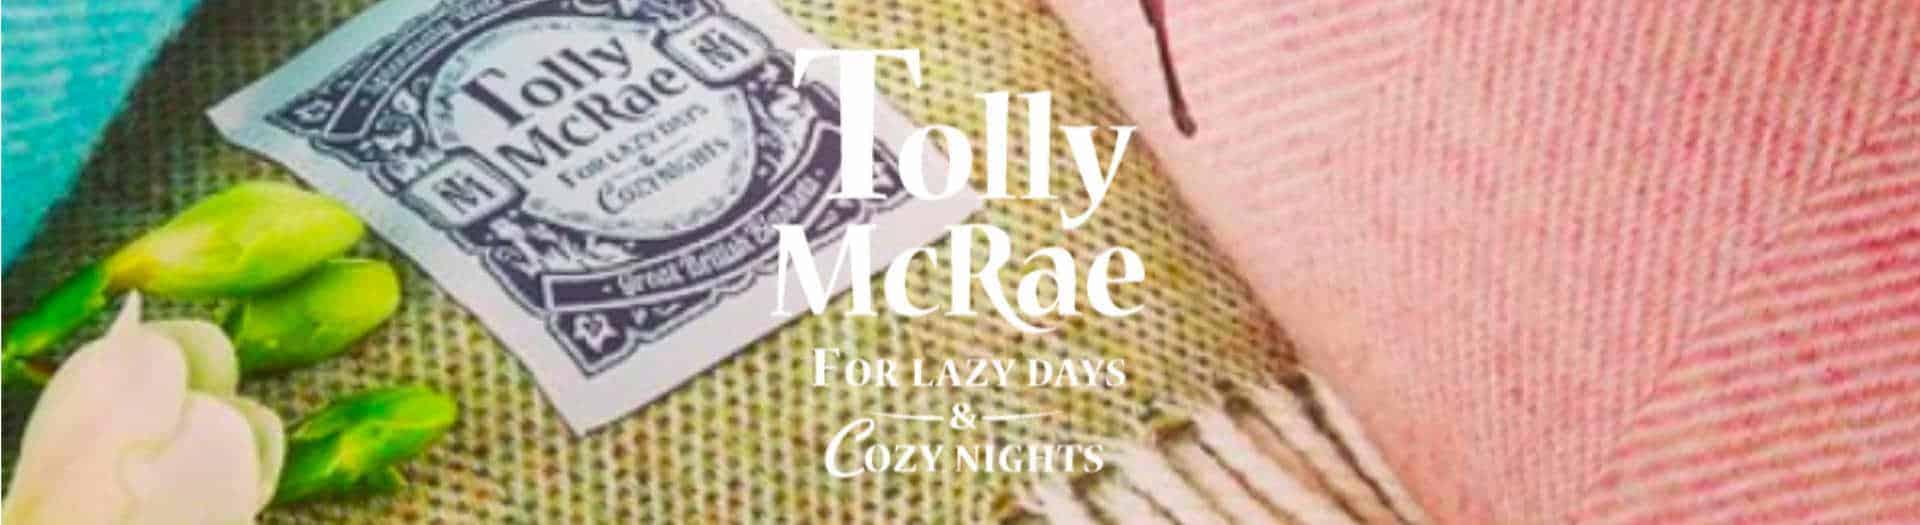 Tolly McRae Wool Picnic Blanket Logo Header